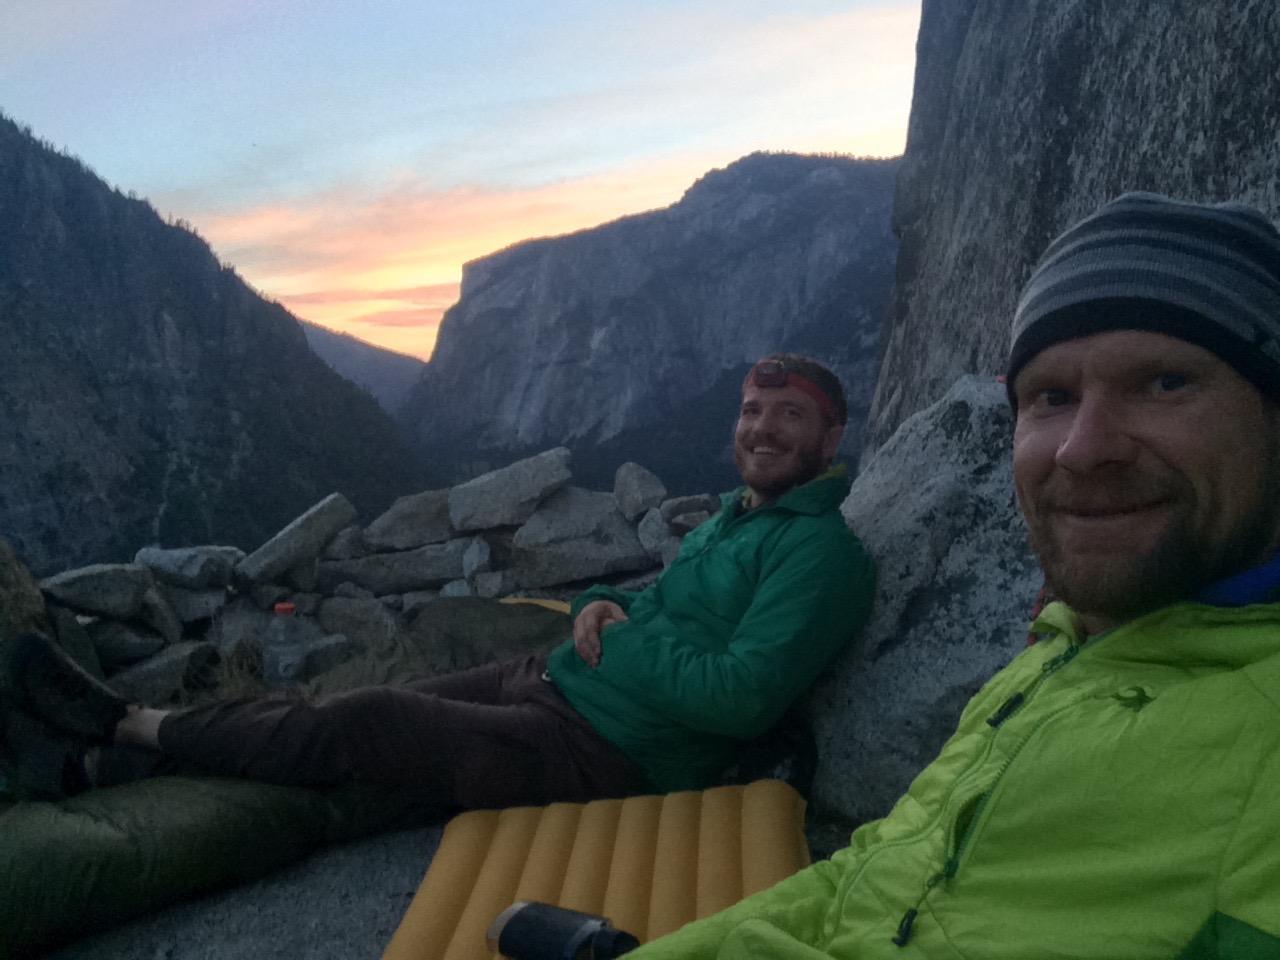 Best wall bivy in Yosemite